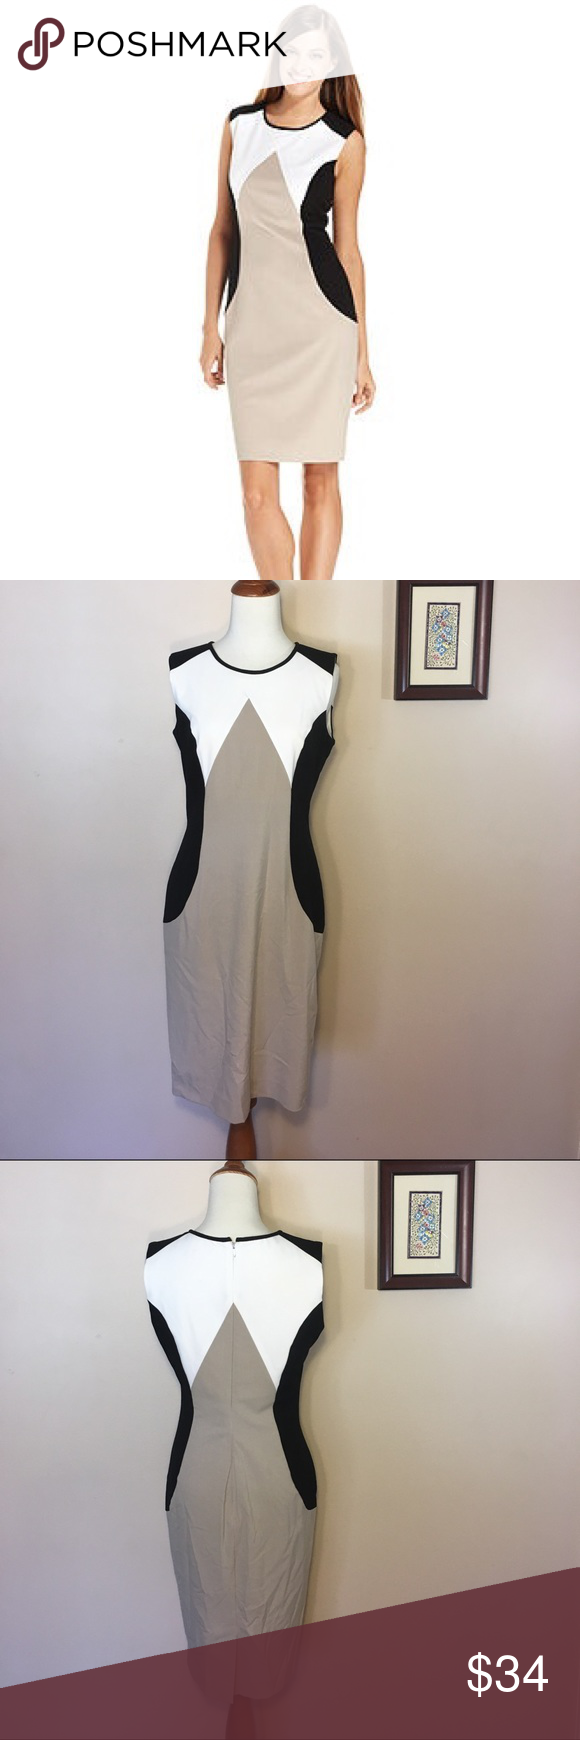 Calvin Klein Color Block Neutral Sheath Dress 4 S Sheath Dress Dresses Career Wear [ 1740 x 580 Pixel ]